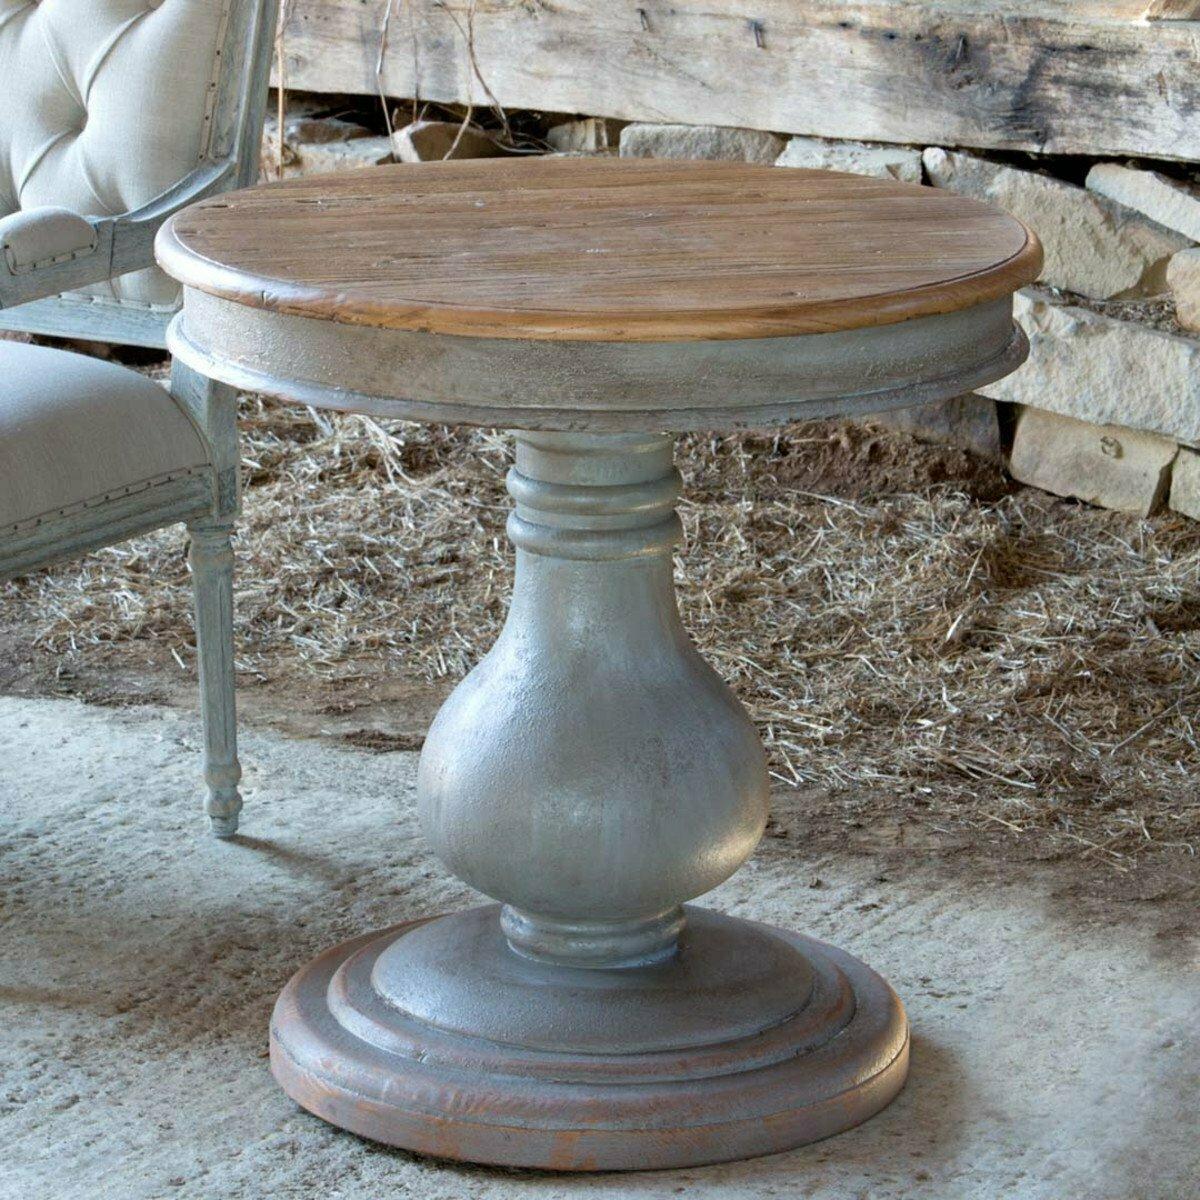 Vintage Wooden Pedestal Table (DISPLAY ONLY)